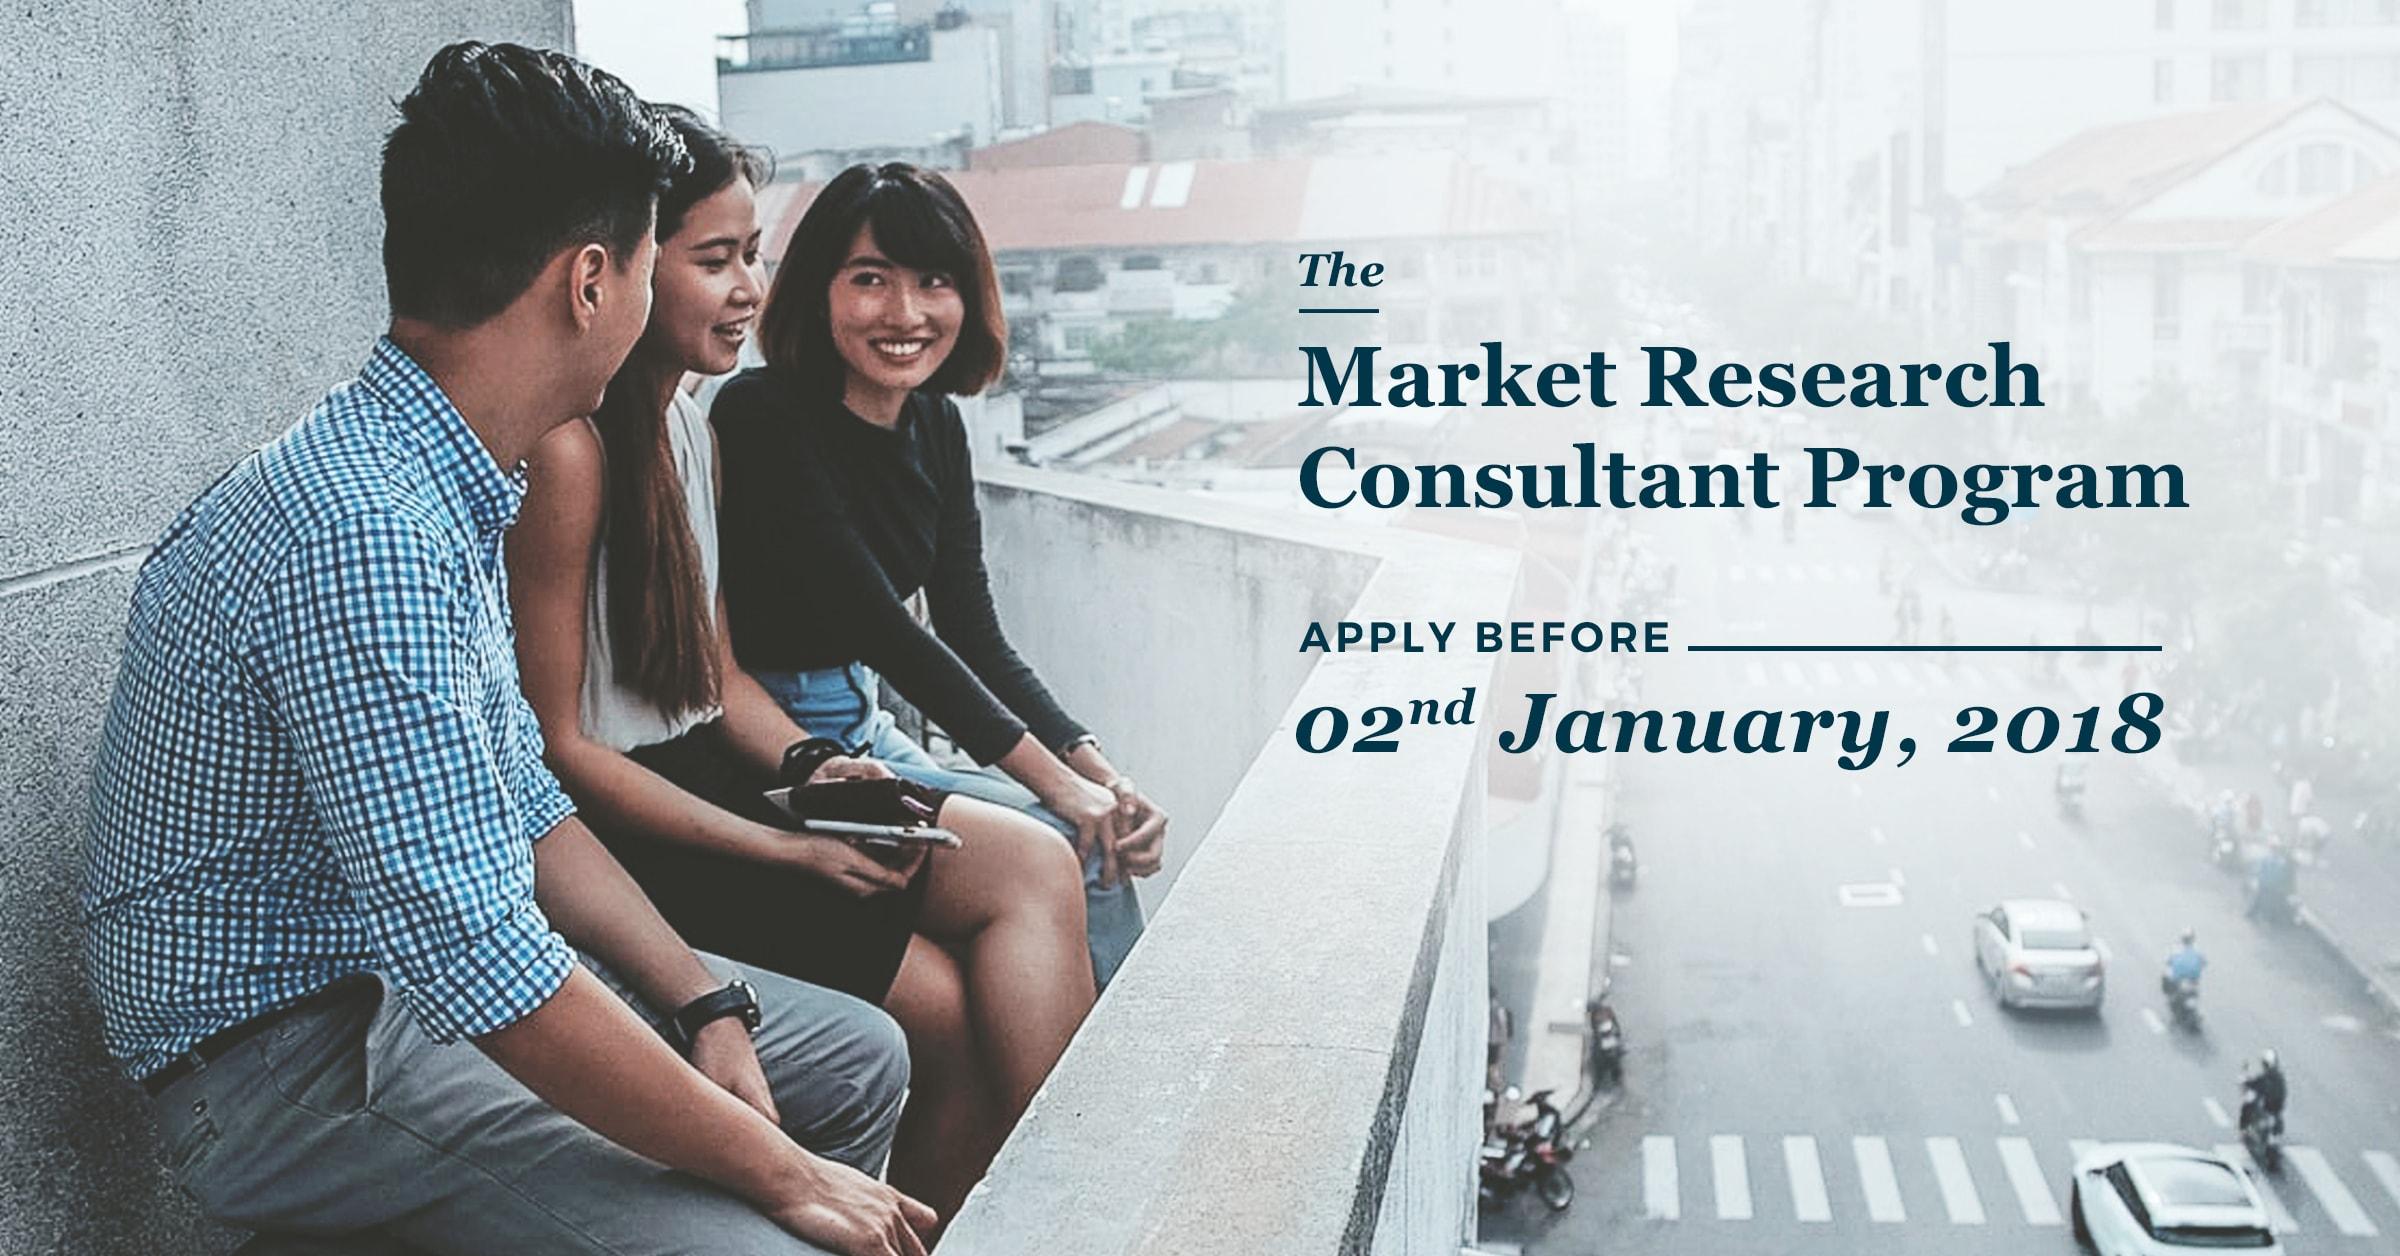 Decision Lab's Market Research Consultant Program